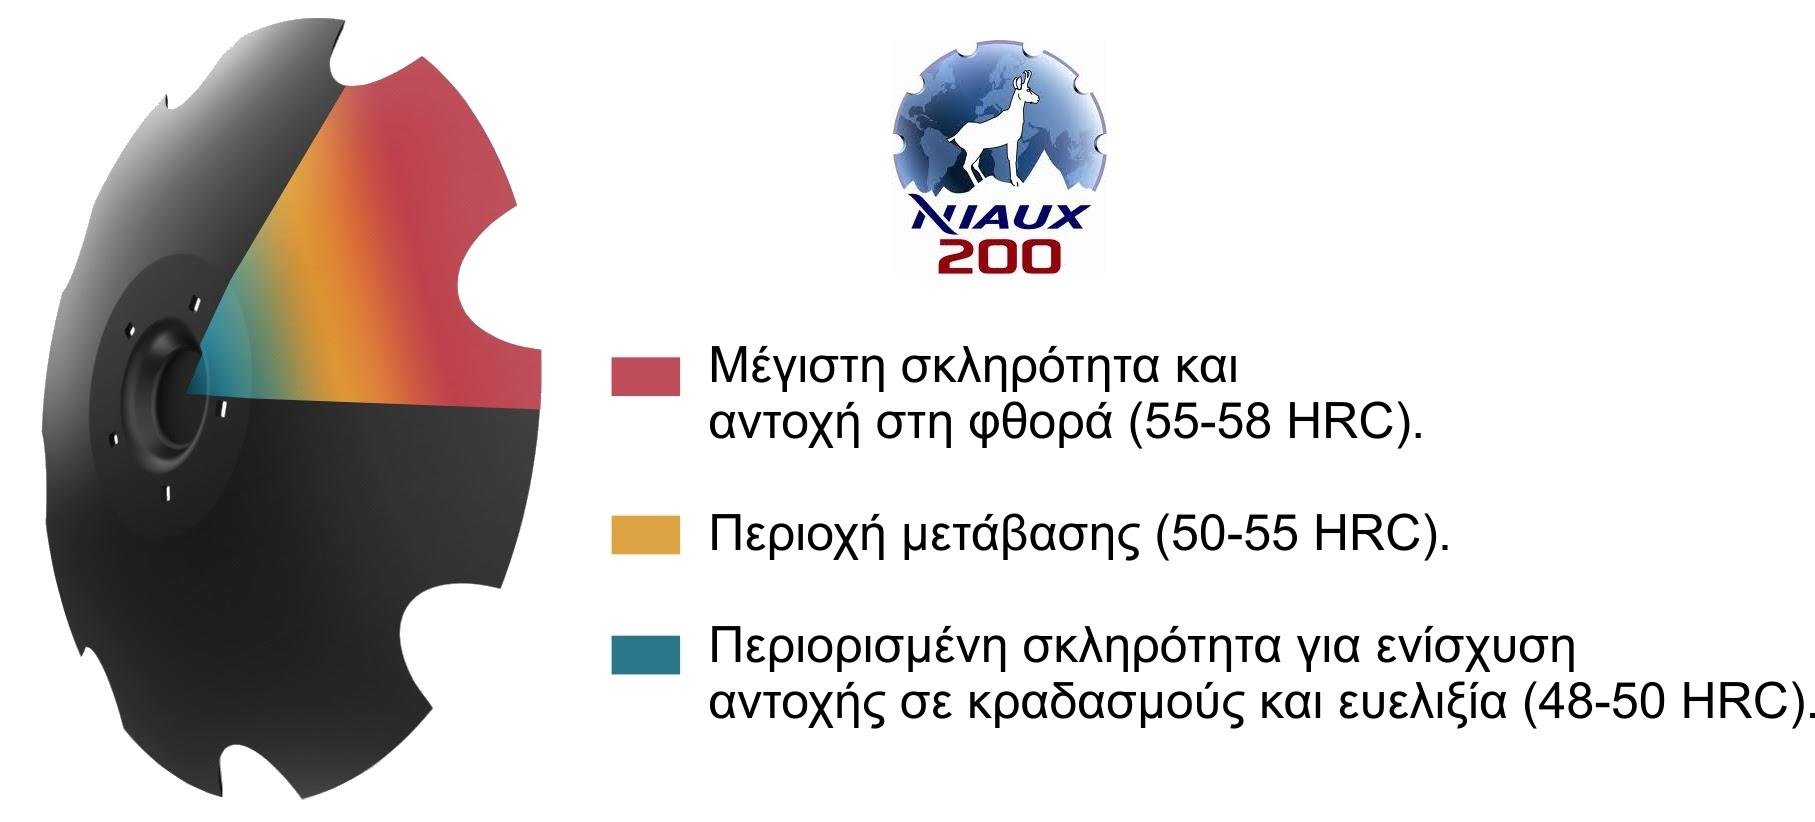 NIAUX 200, discs, siptec, papadopoulos